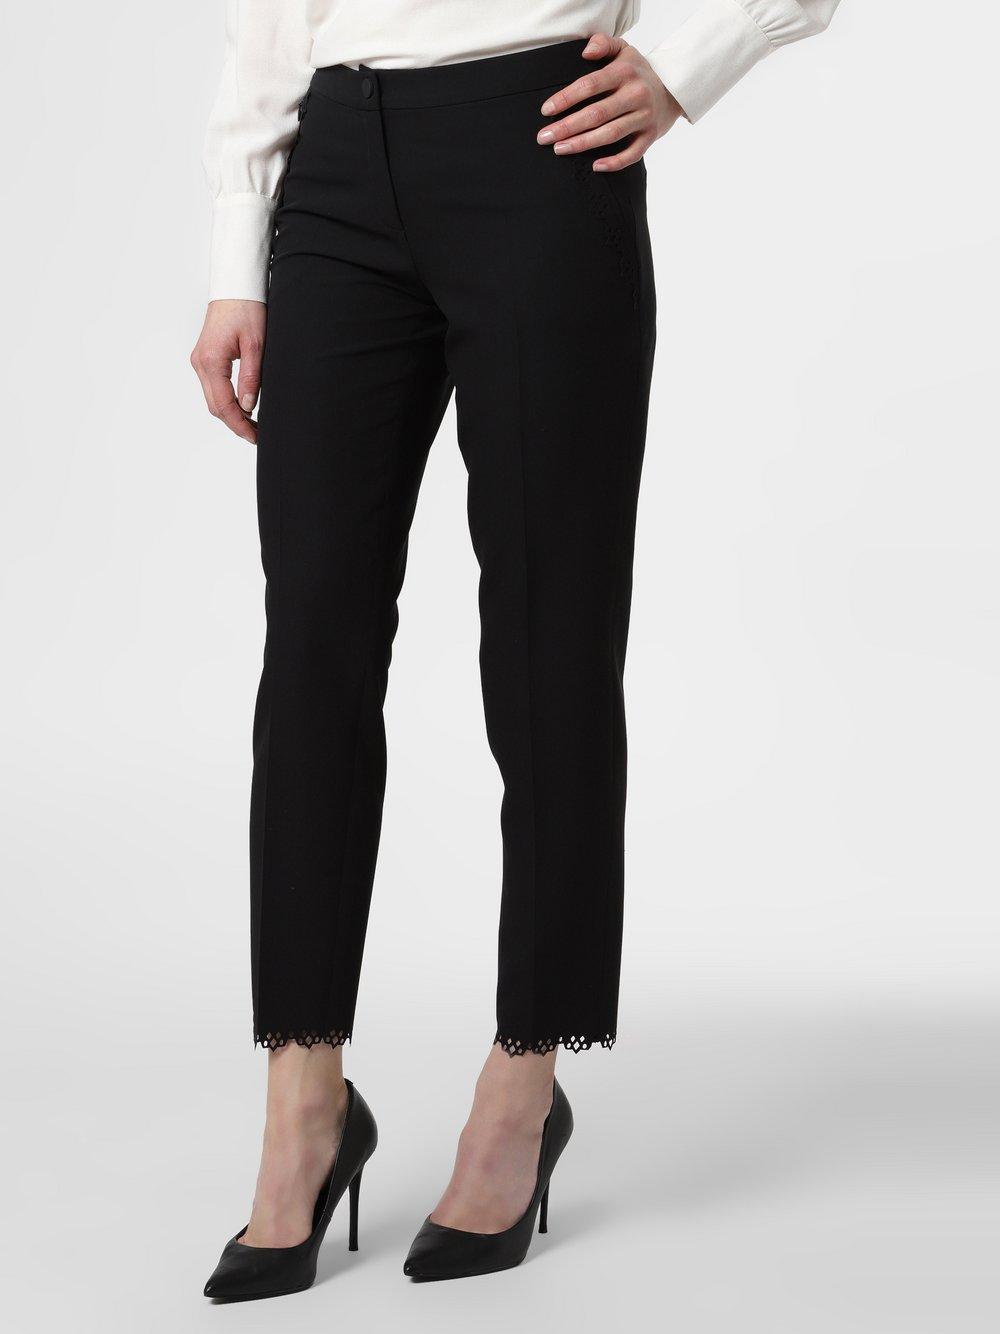 Rosner - Spodnie damskie – Alisa, czarny